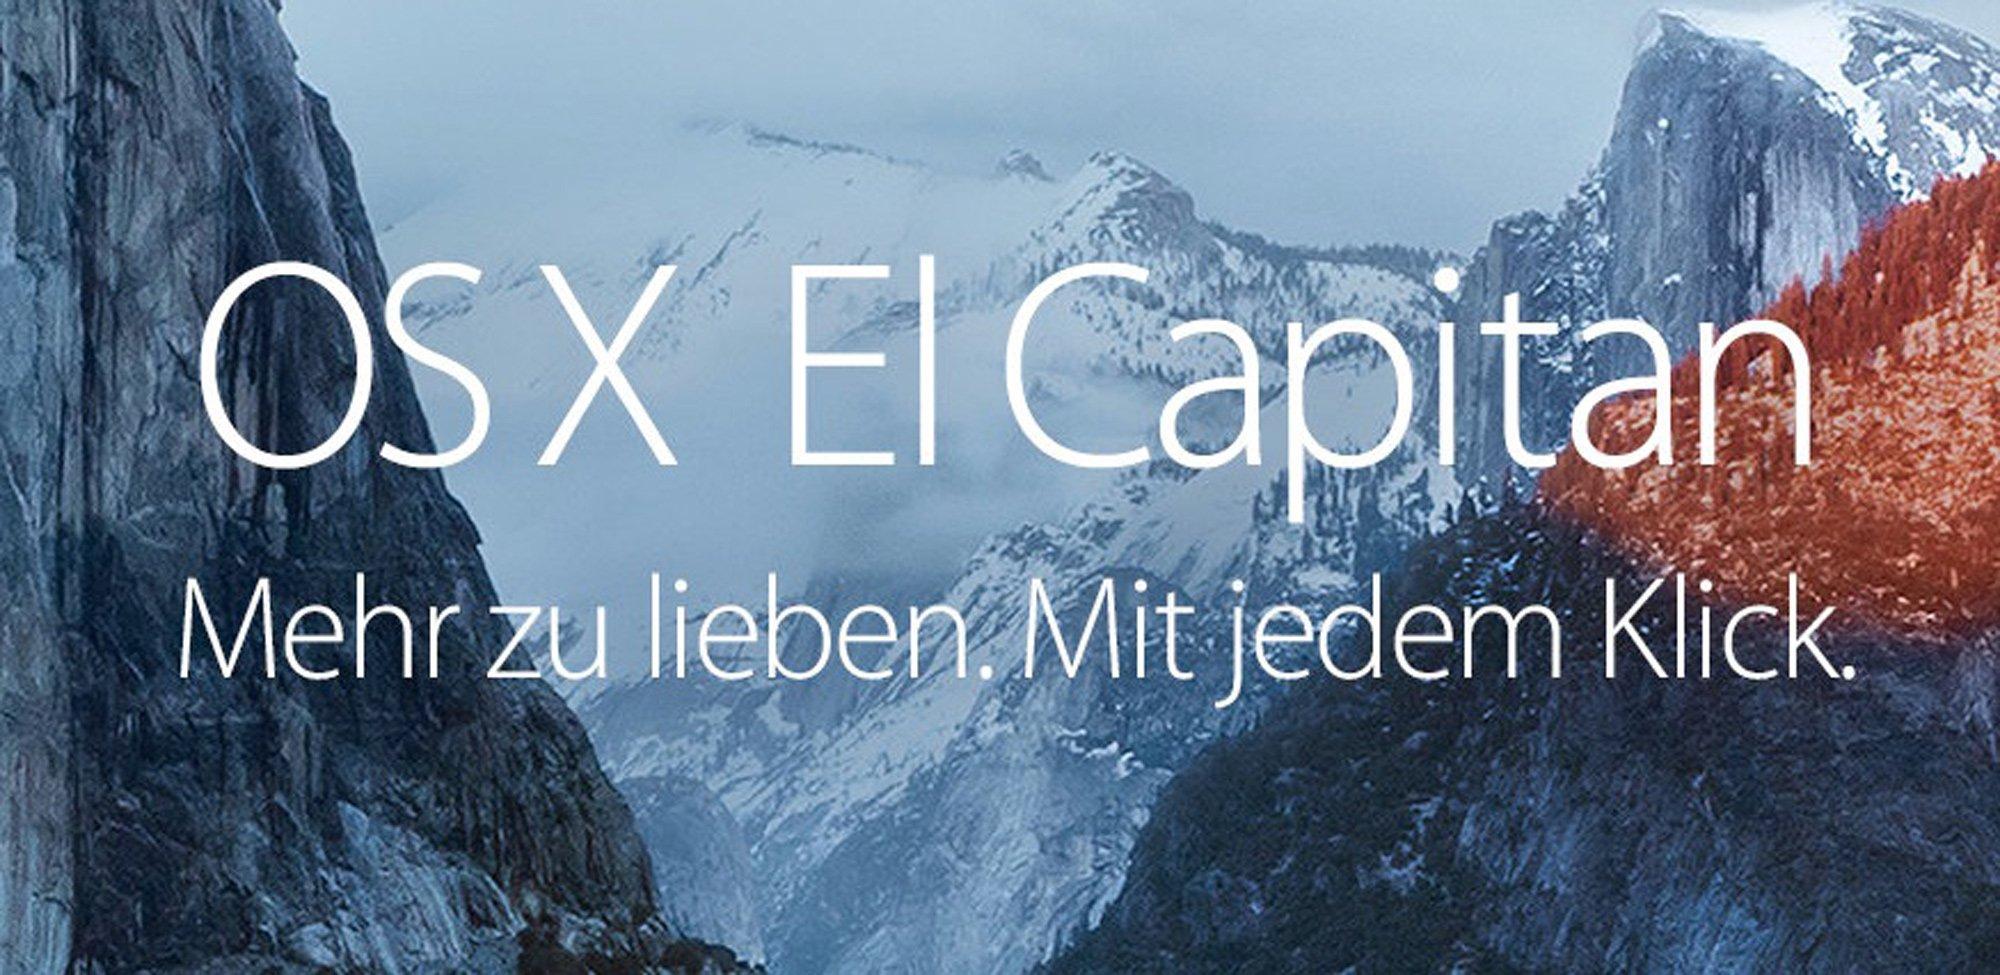 Apple El Capitan OS X 10.11.1 Update verfügbar 1